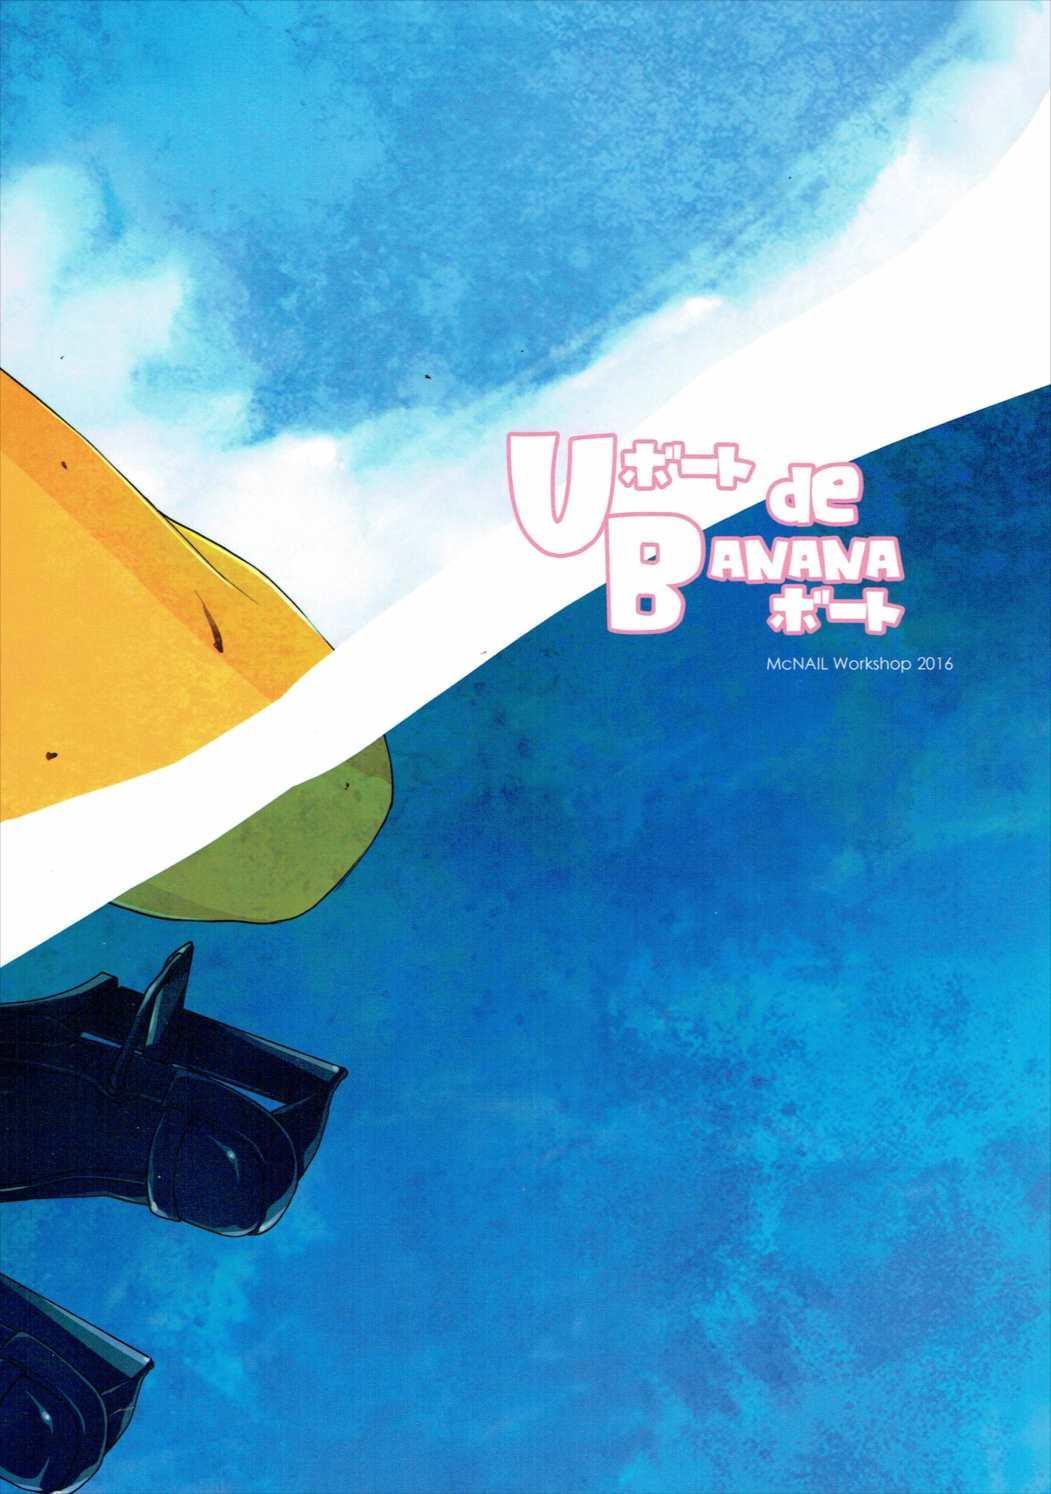 U-boat de BANANA Boat 23